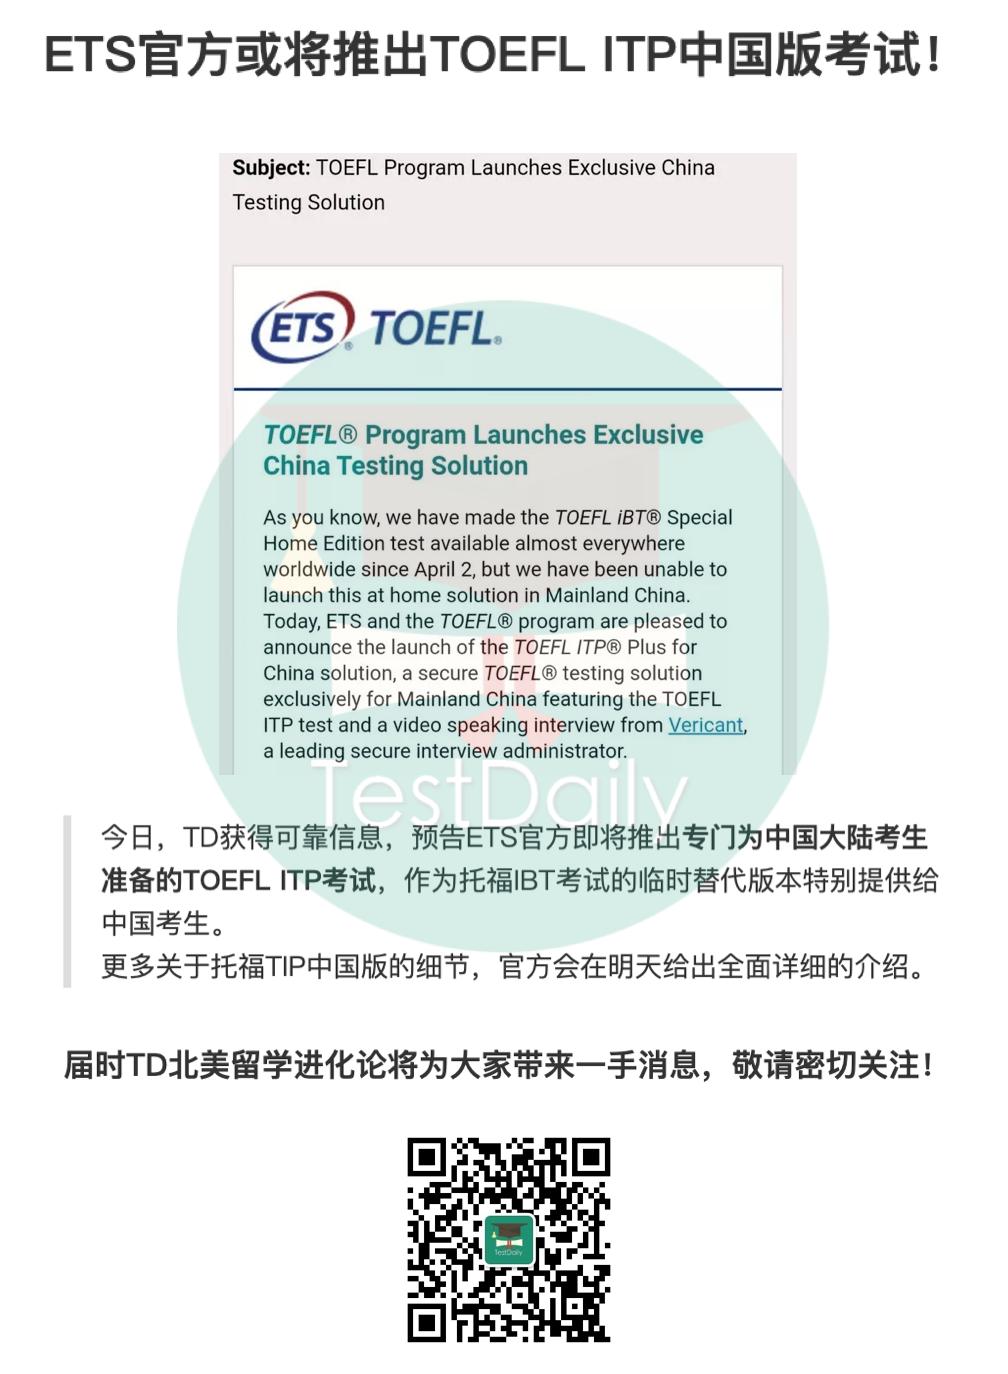 ETS官方将推出TOEFL ITP中国版考试,替代托福IBT!中国大陆考生有福了